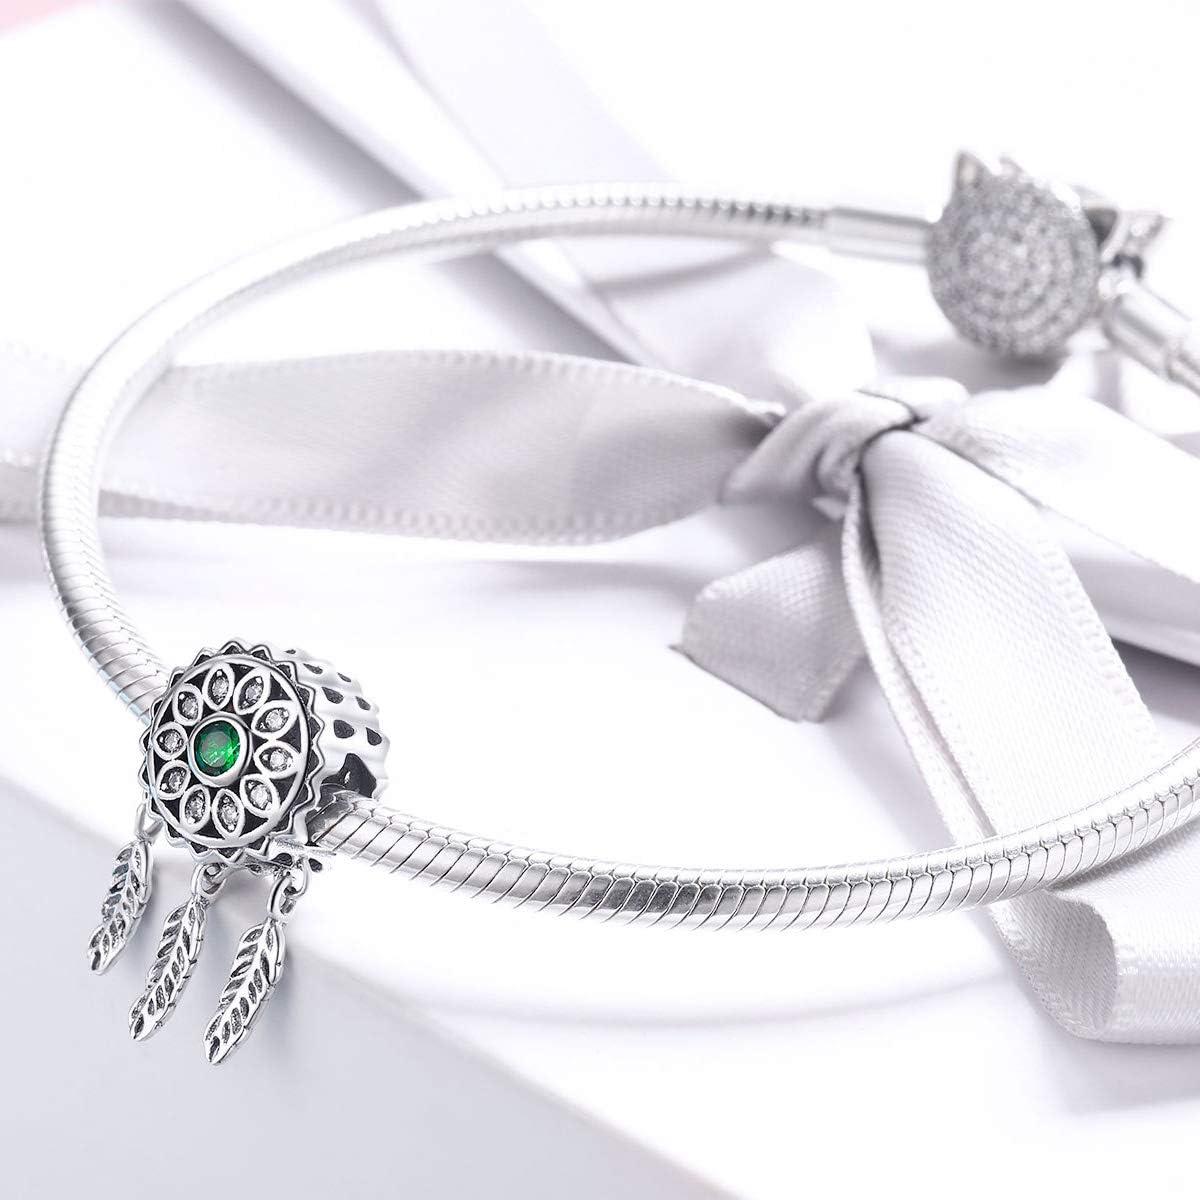 The Kiss Vintage Dream Catcher CZ 925 Sterling Silver Bead Fits European Charm Bracelet